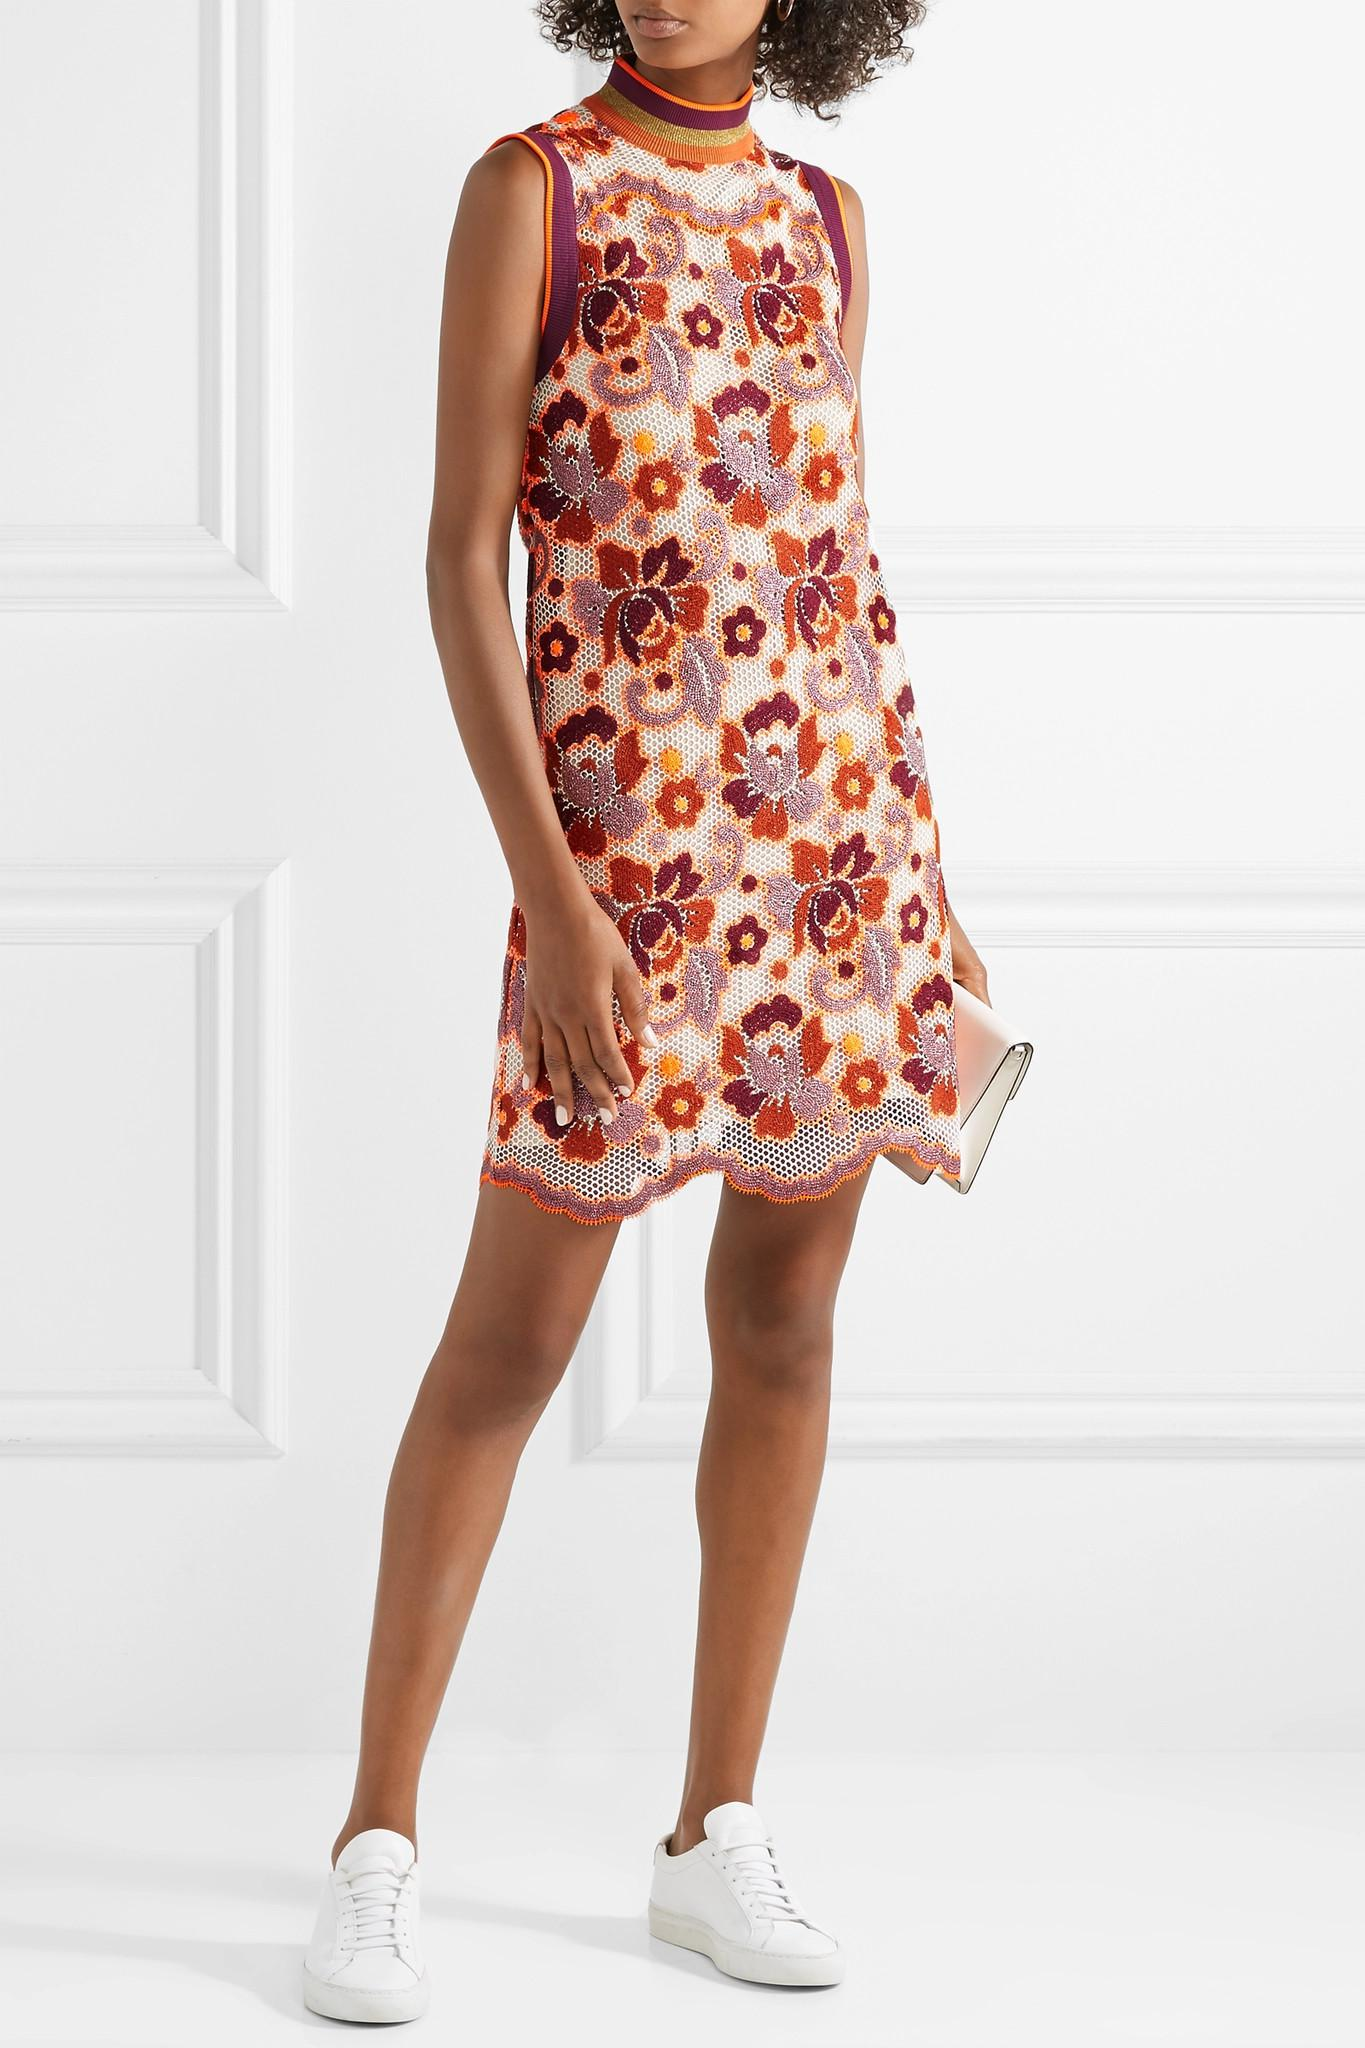 Crocheted Lace Mini Dress - Orange Burberry QBGPwen